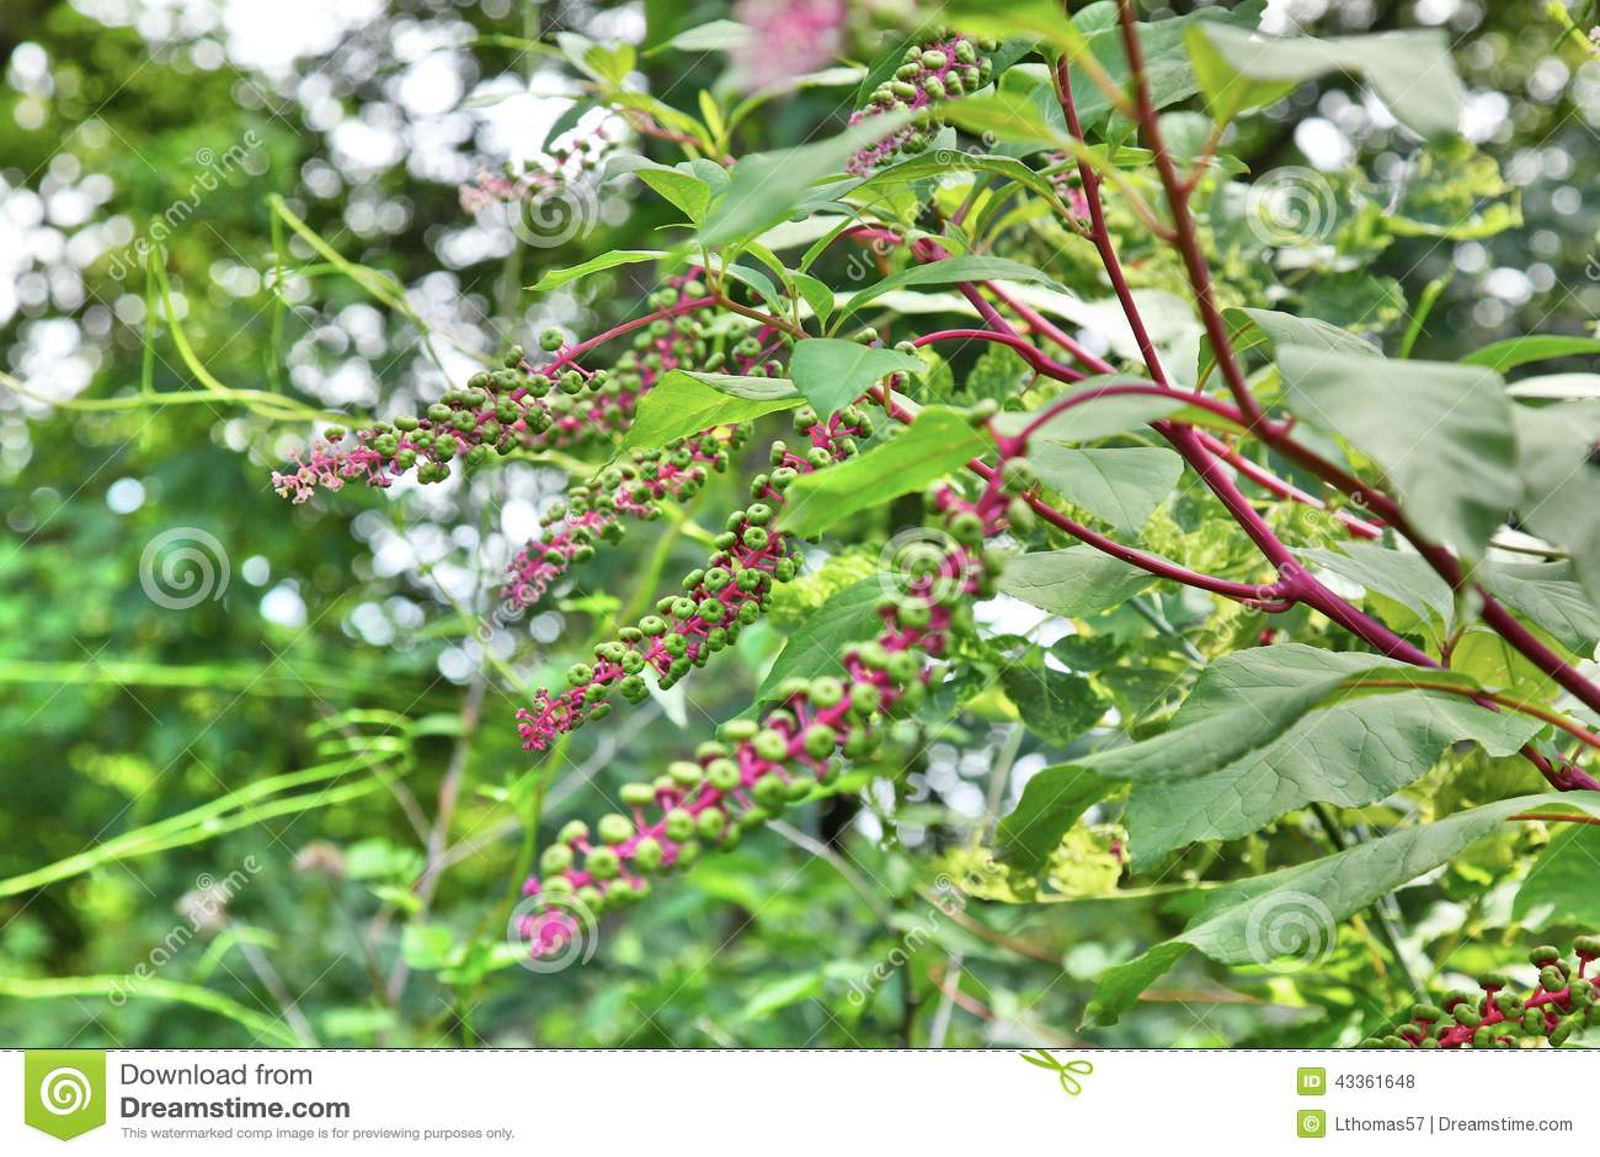 American Pokeweed aka Poke Sallet branches